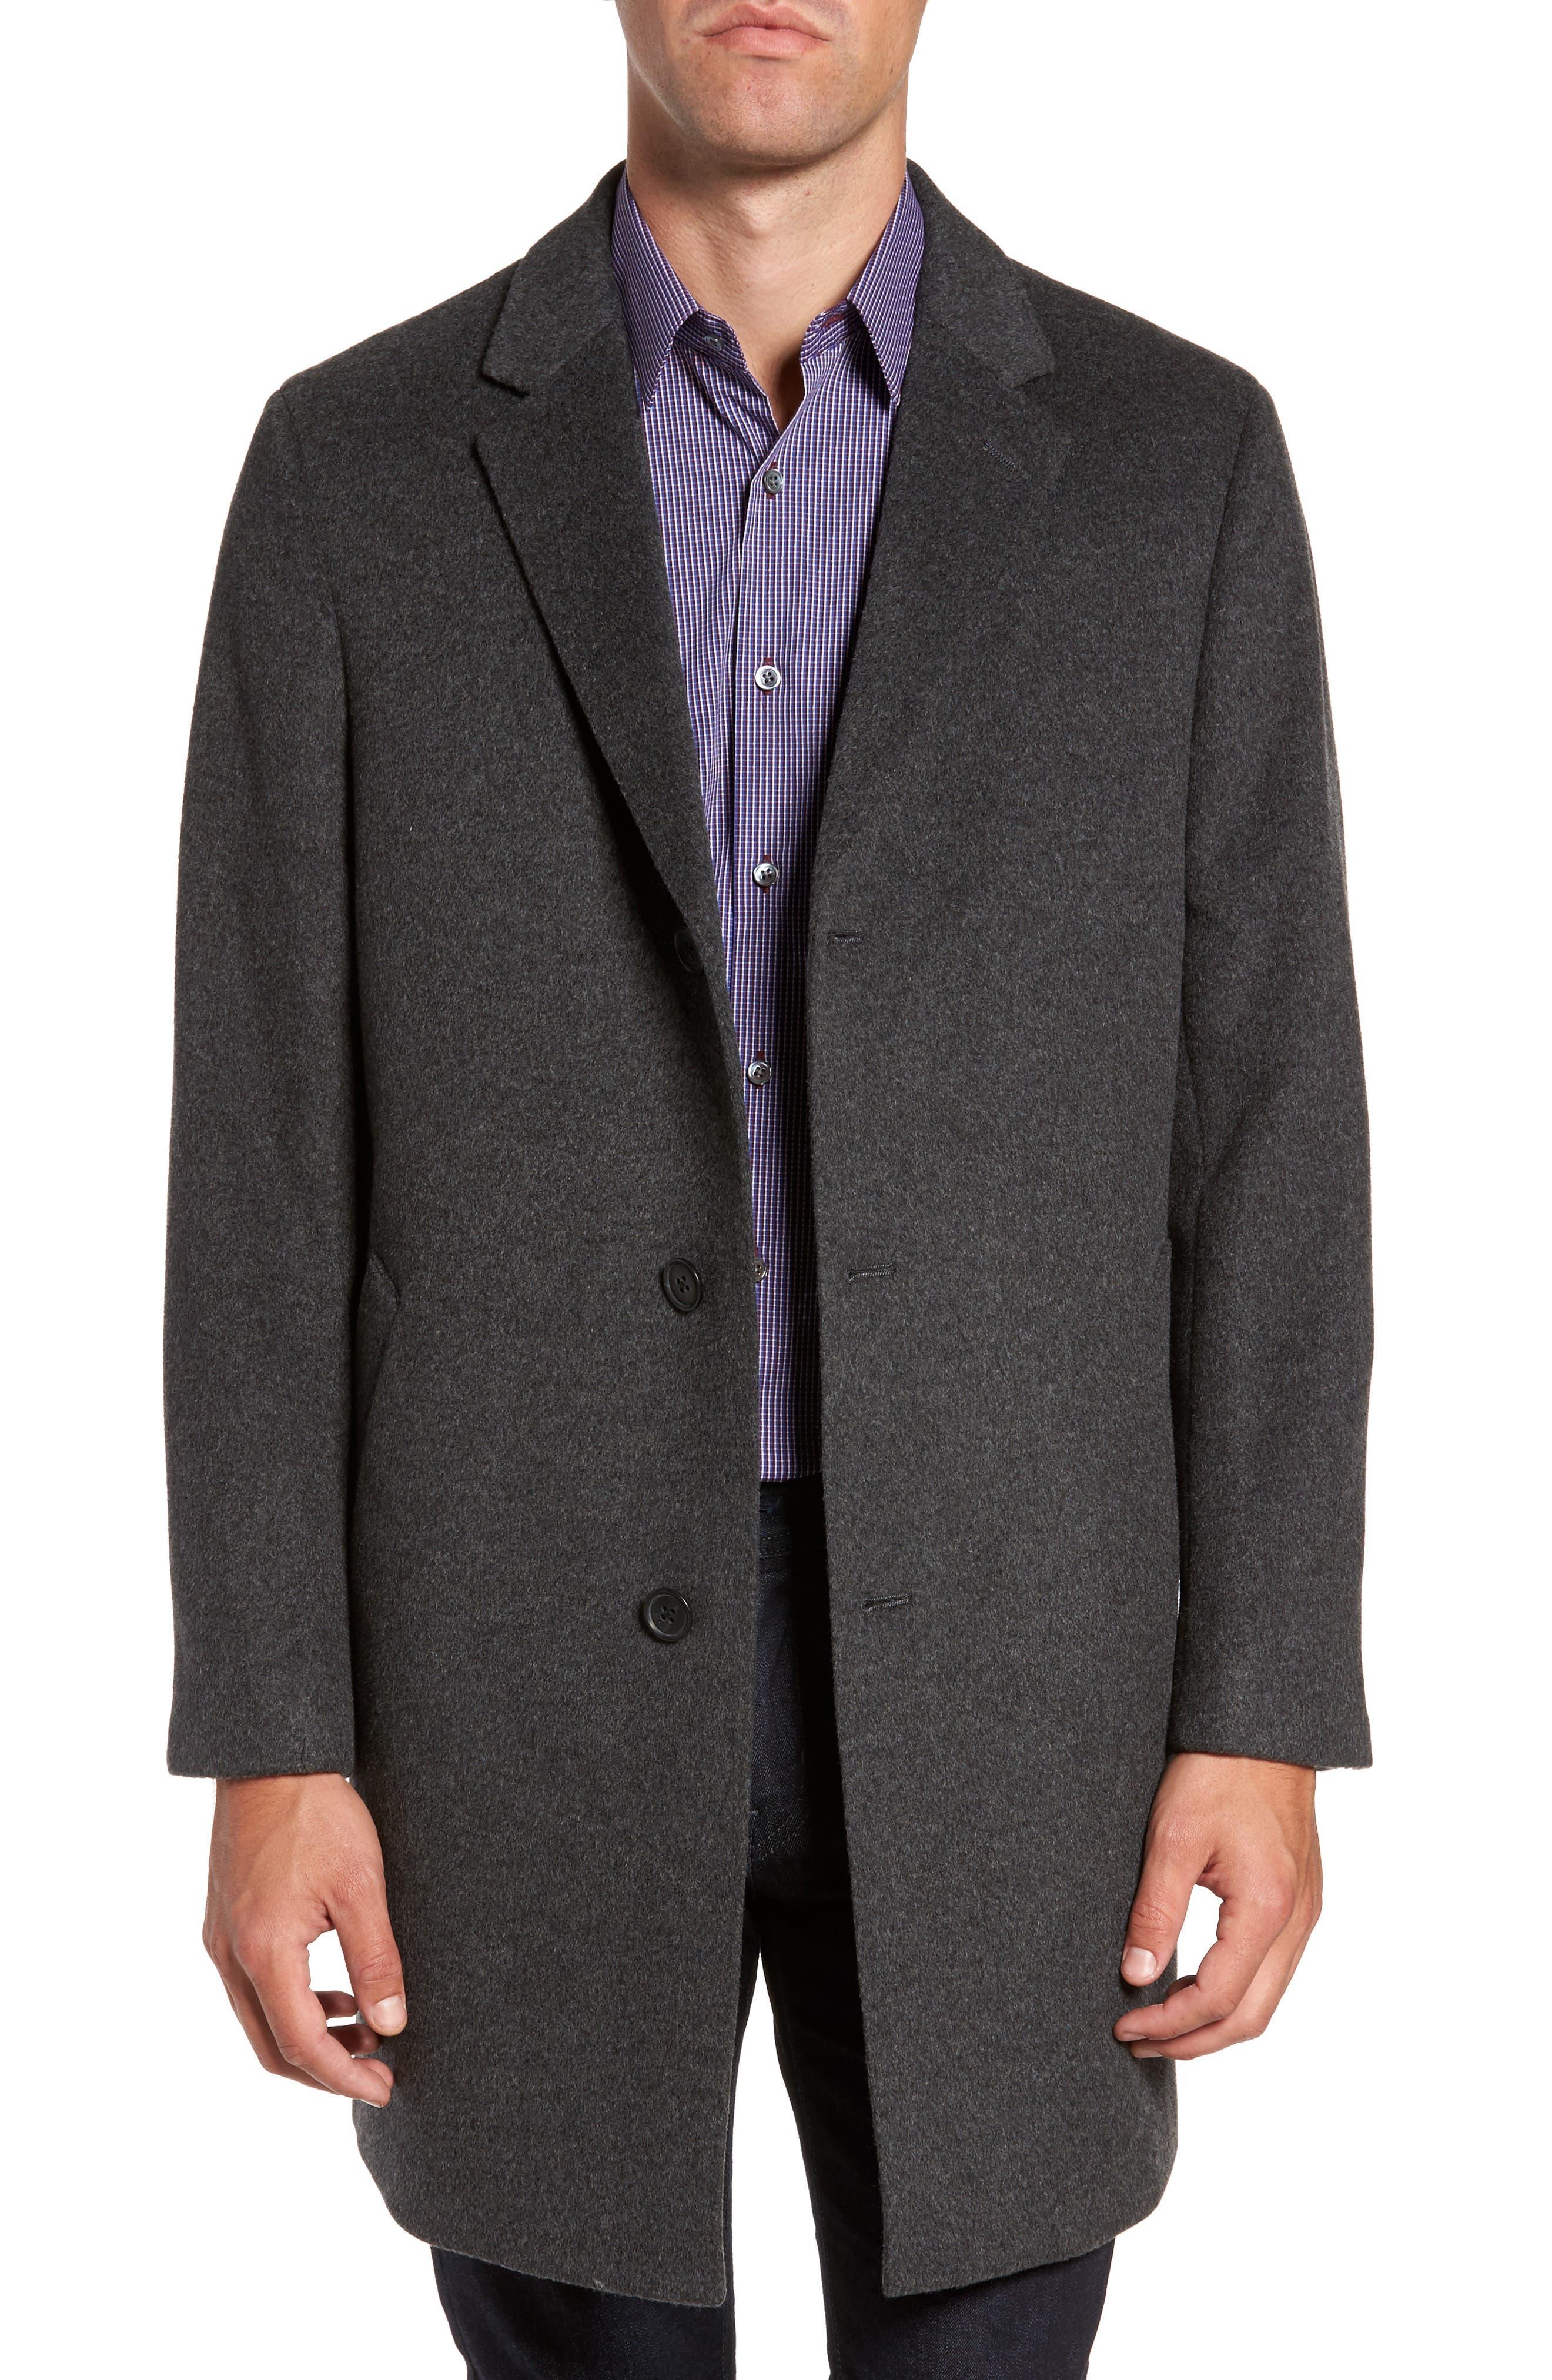 Main Image - Nordstrom Men's Shop Mason Wool & Cashmere Overcoat